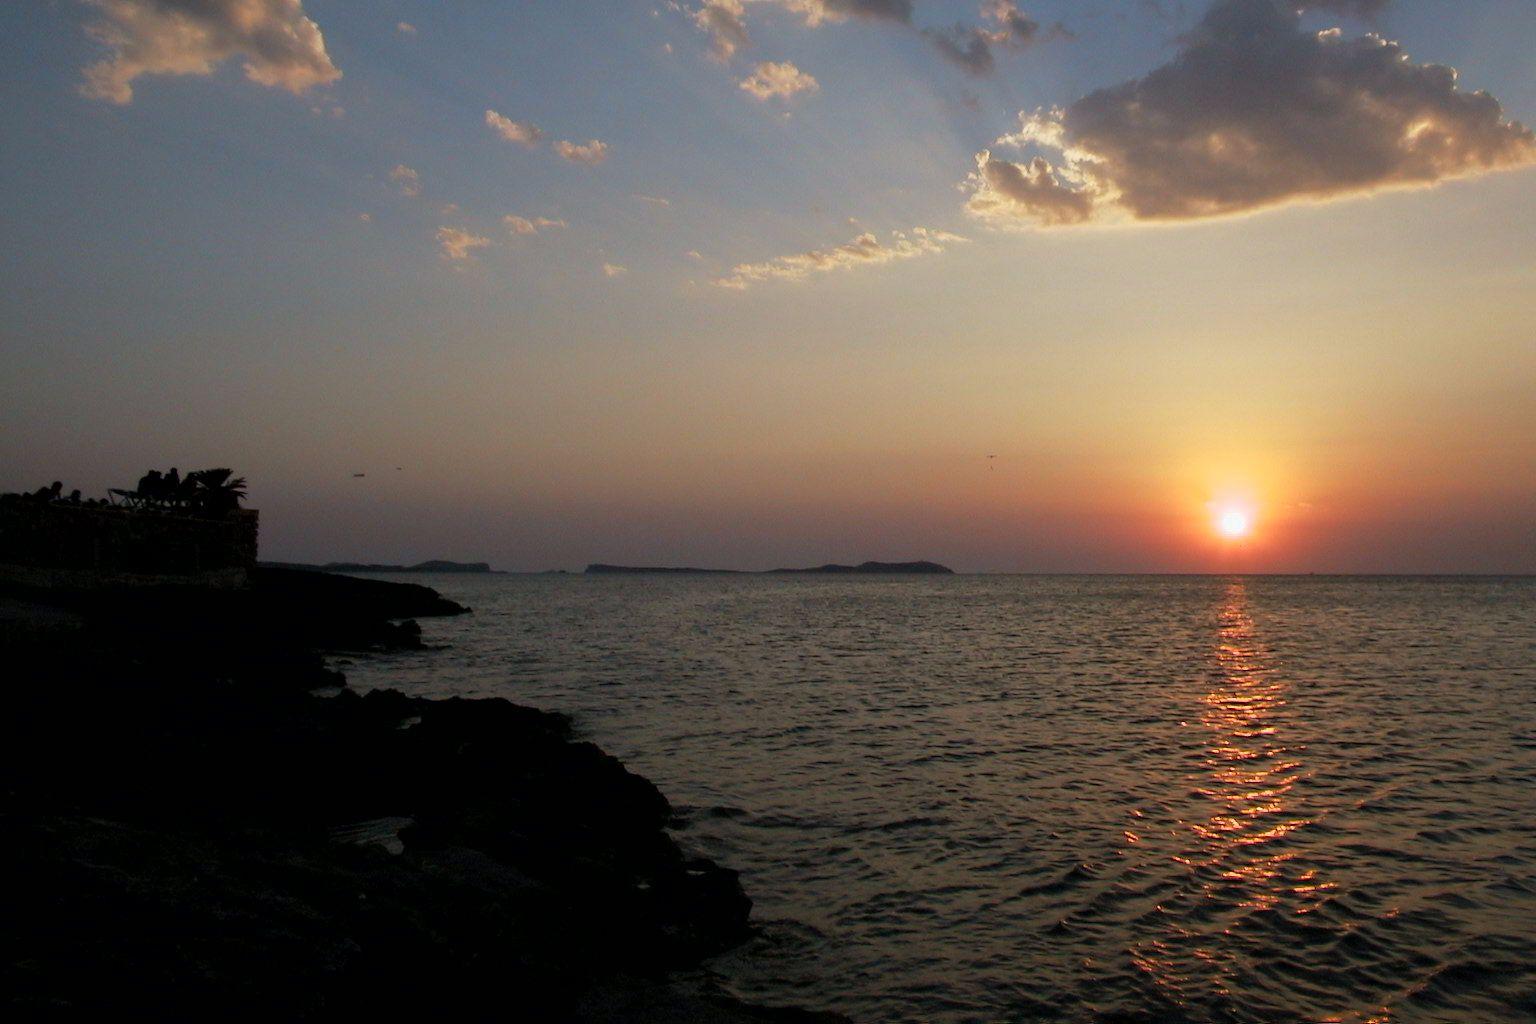 San Antonio Abad Ibiza Islas Baleares Spain By Valentin Enrique закаты восход